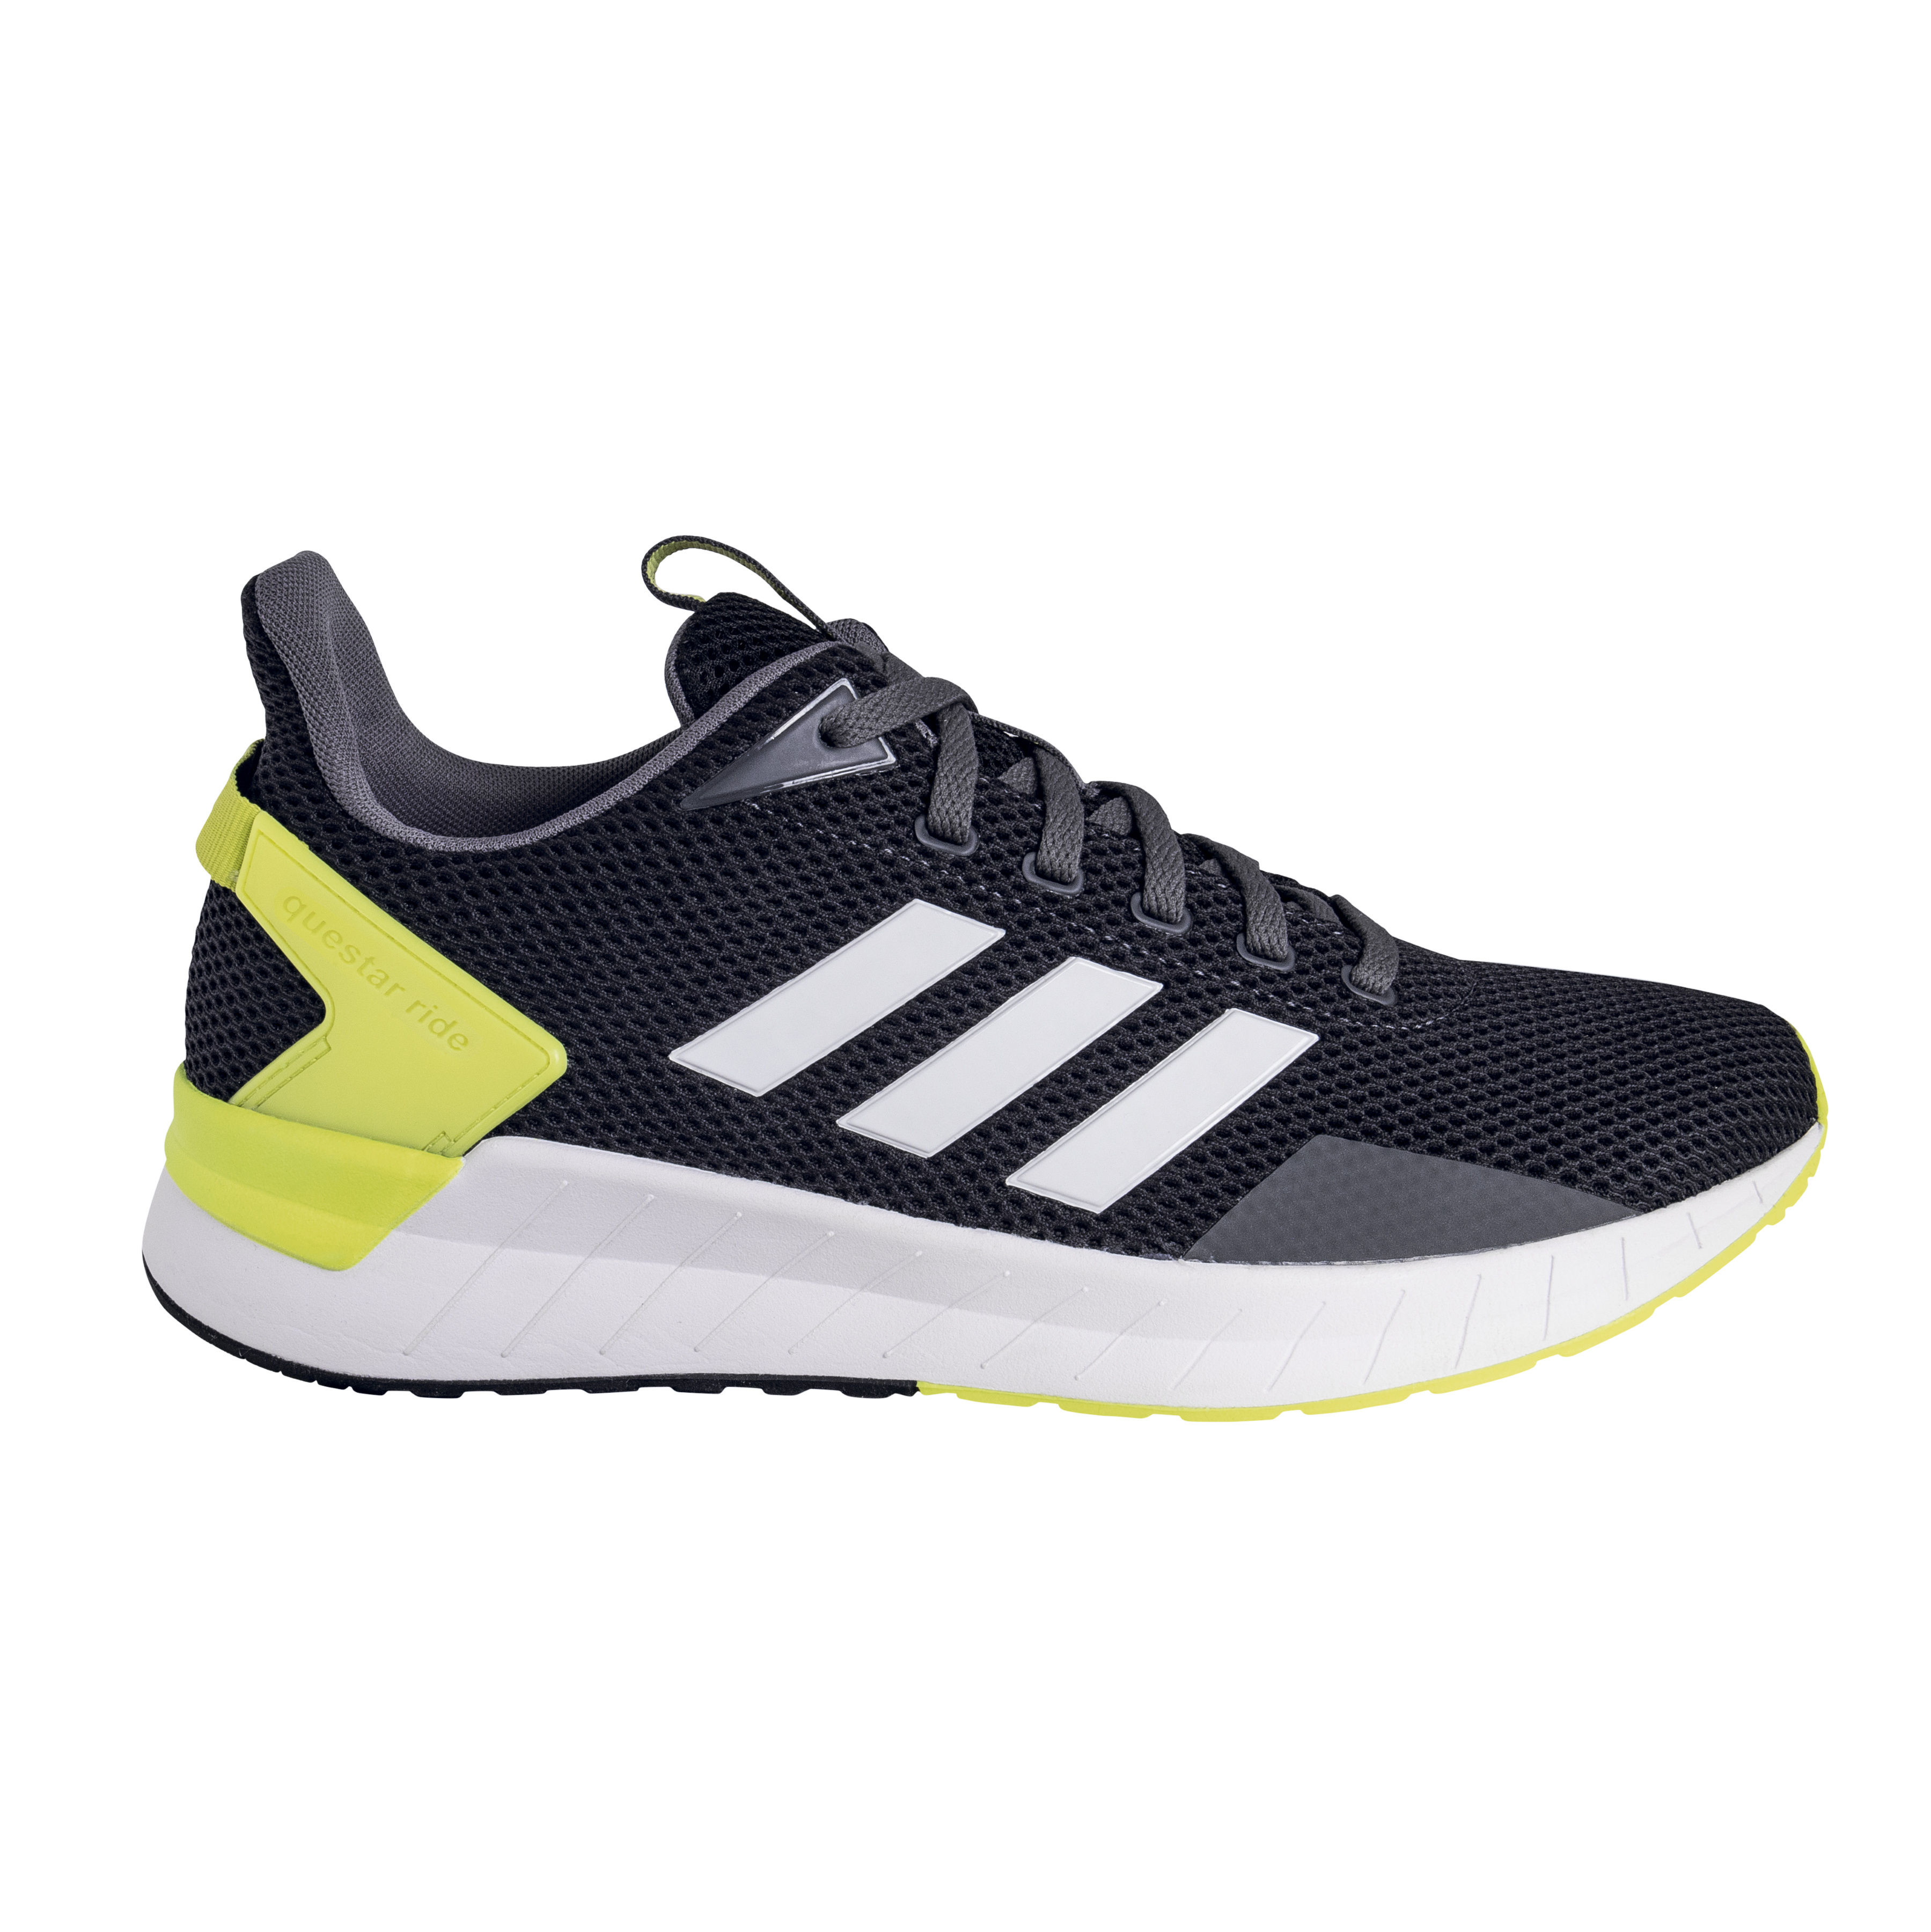 Questar Hommes Running Ride Adidas Chaussure De cTK3F1lJ